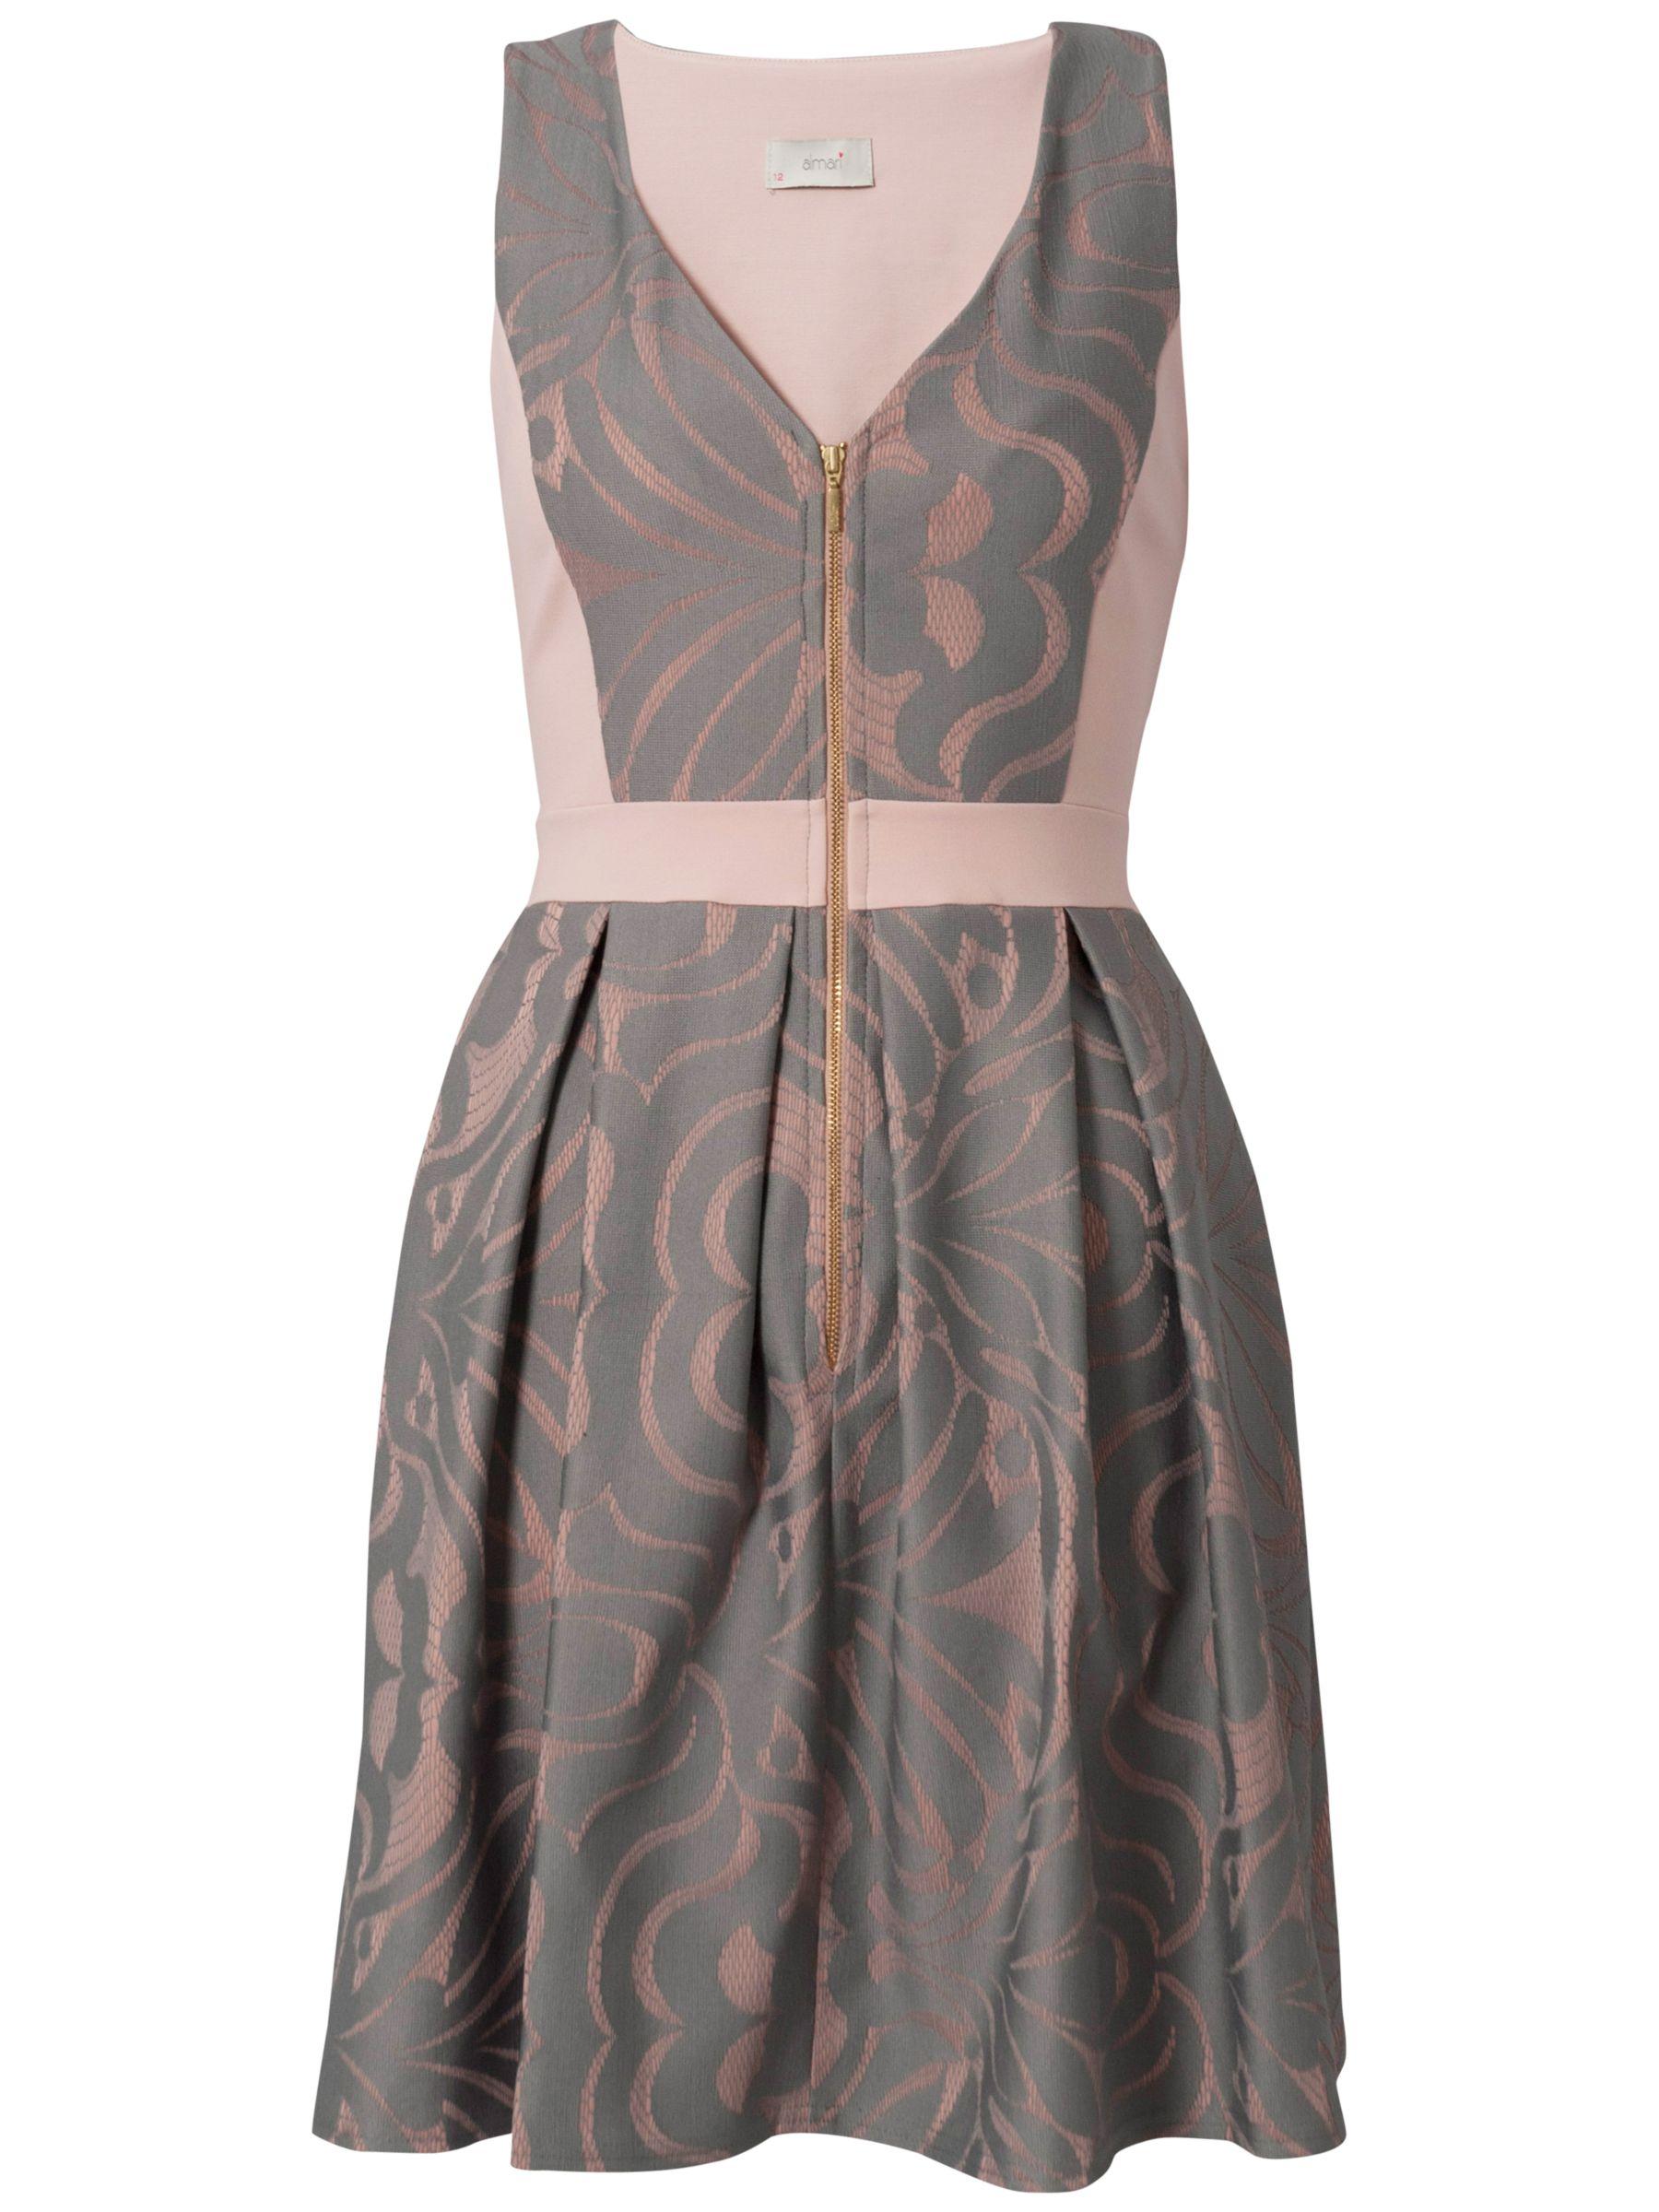 almari bonded lace dress pale pink, almari, bonded, lace, dress, pale, pink, 10 8 12 14, women, womens dresses, 1595174